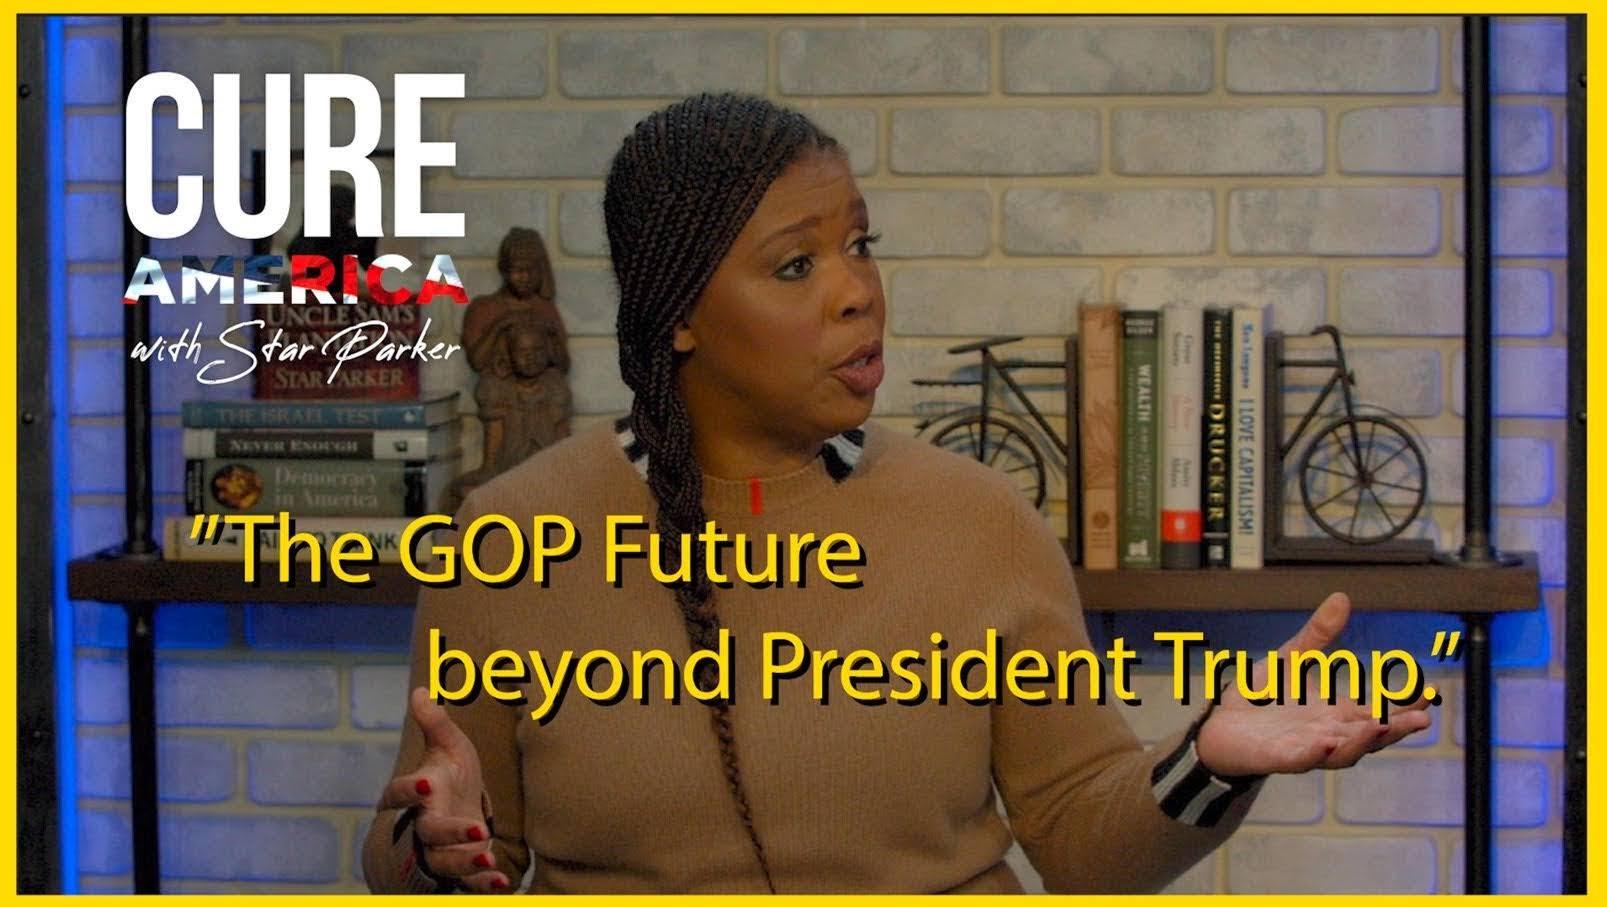 The GOP Future Beyond President Trump